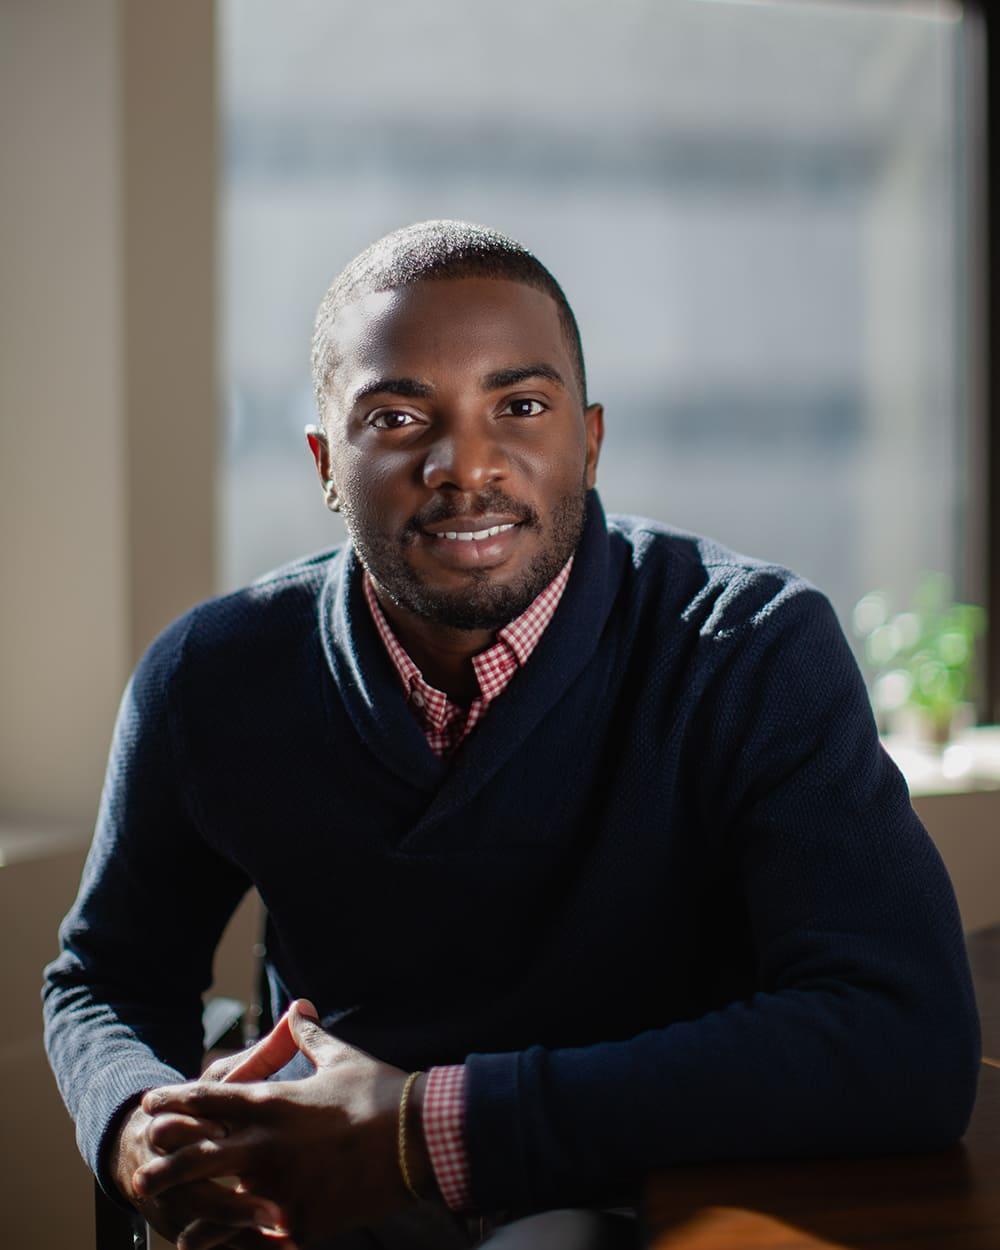 Tyrone Dillard portrait